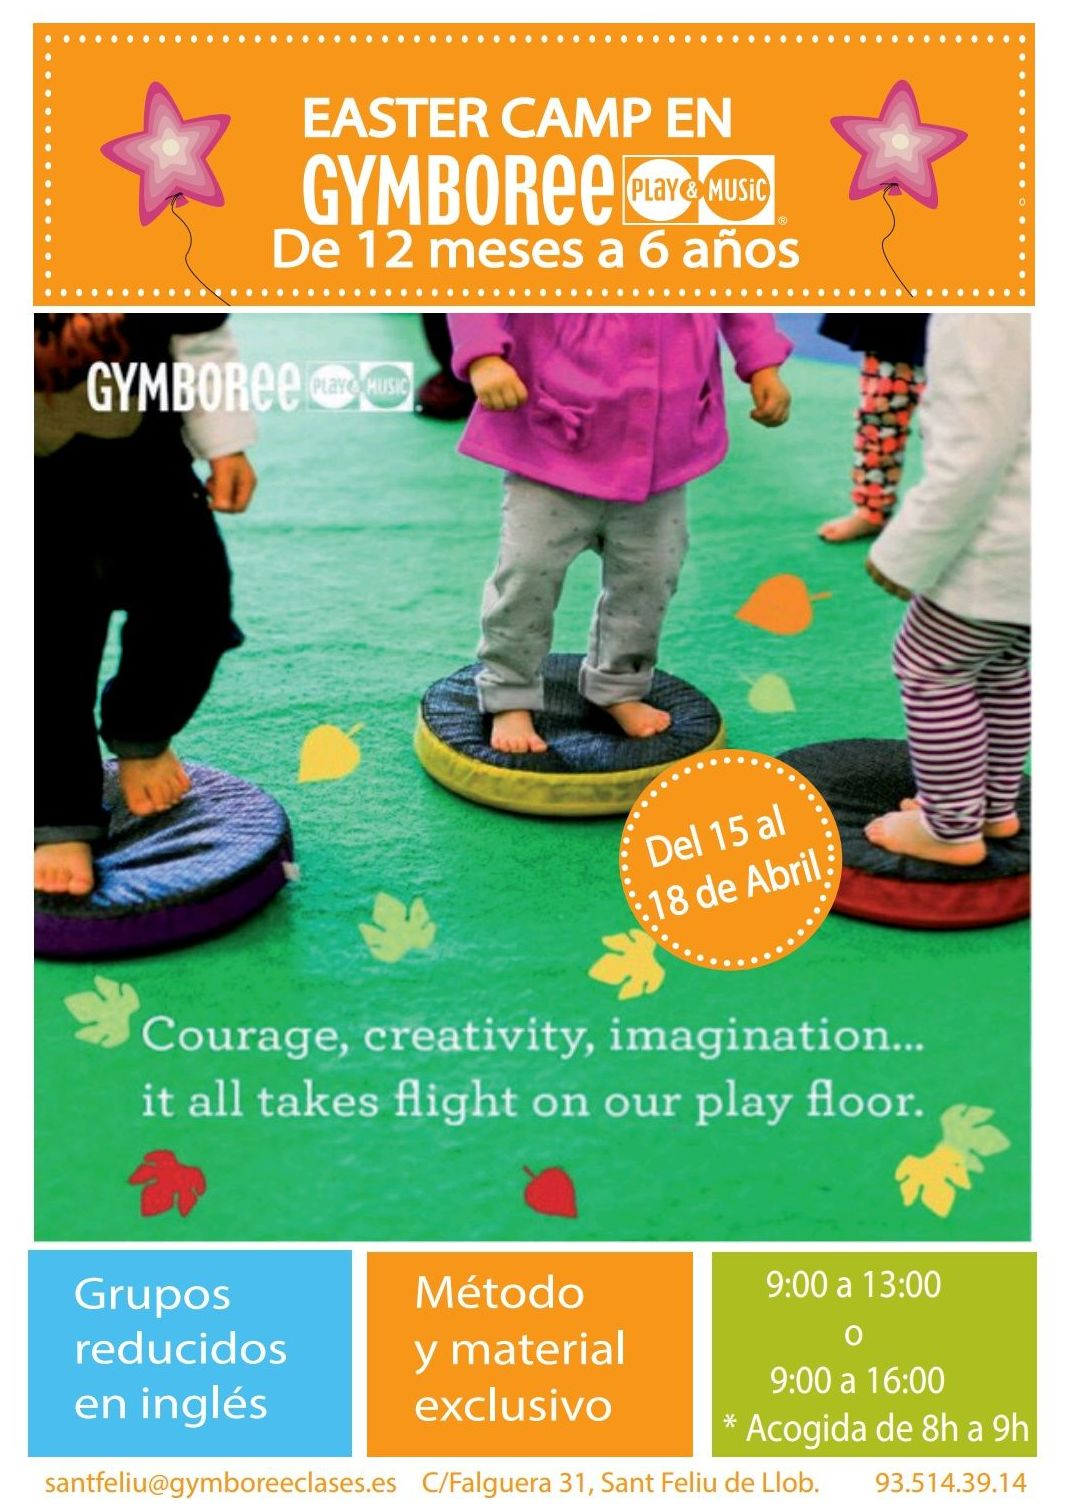 EASTER CAMP: Actividades de Gymboree Play & Music Sant Feliu